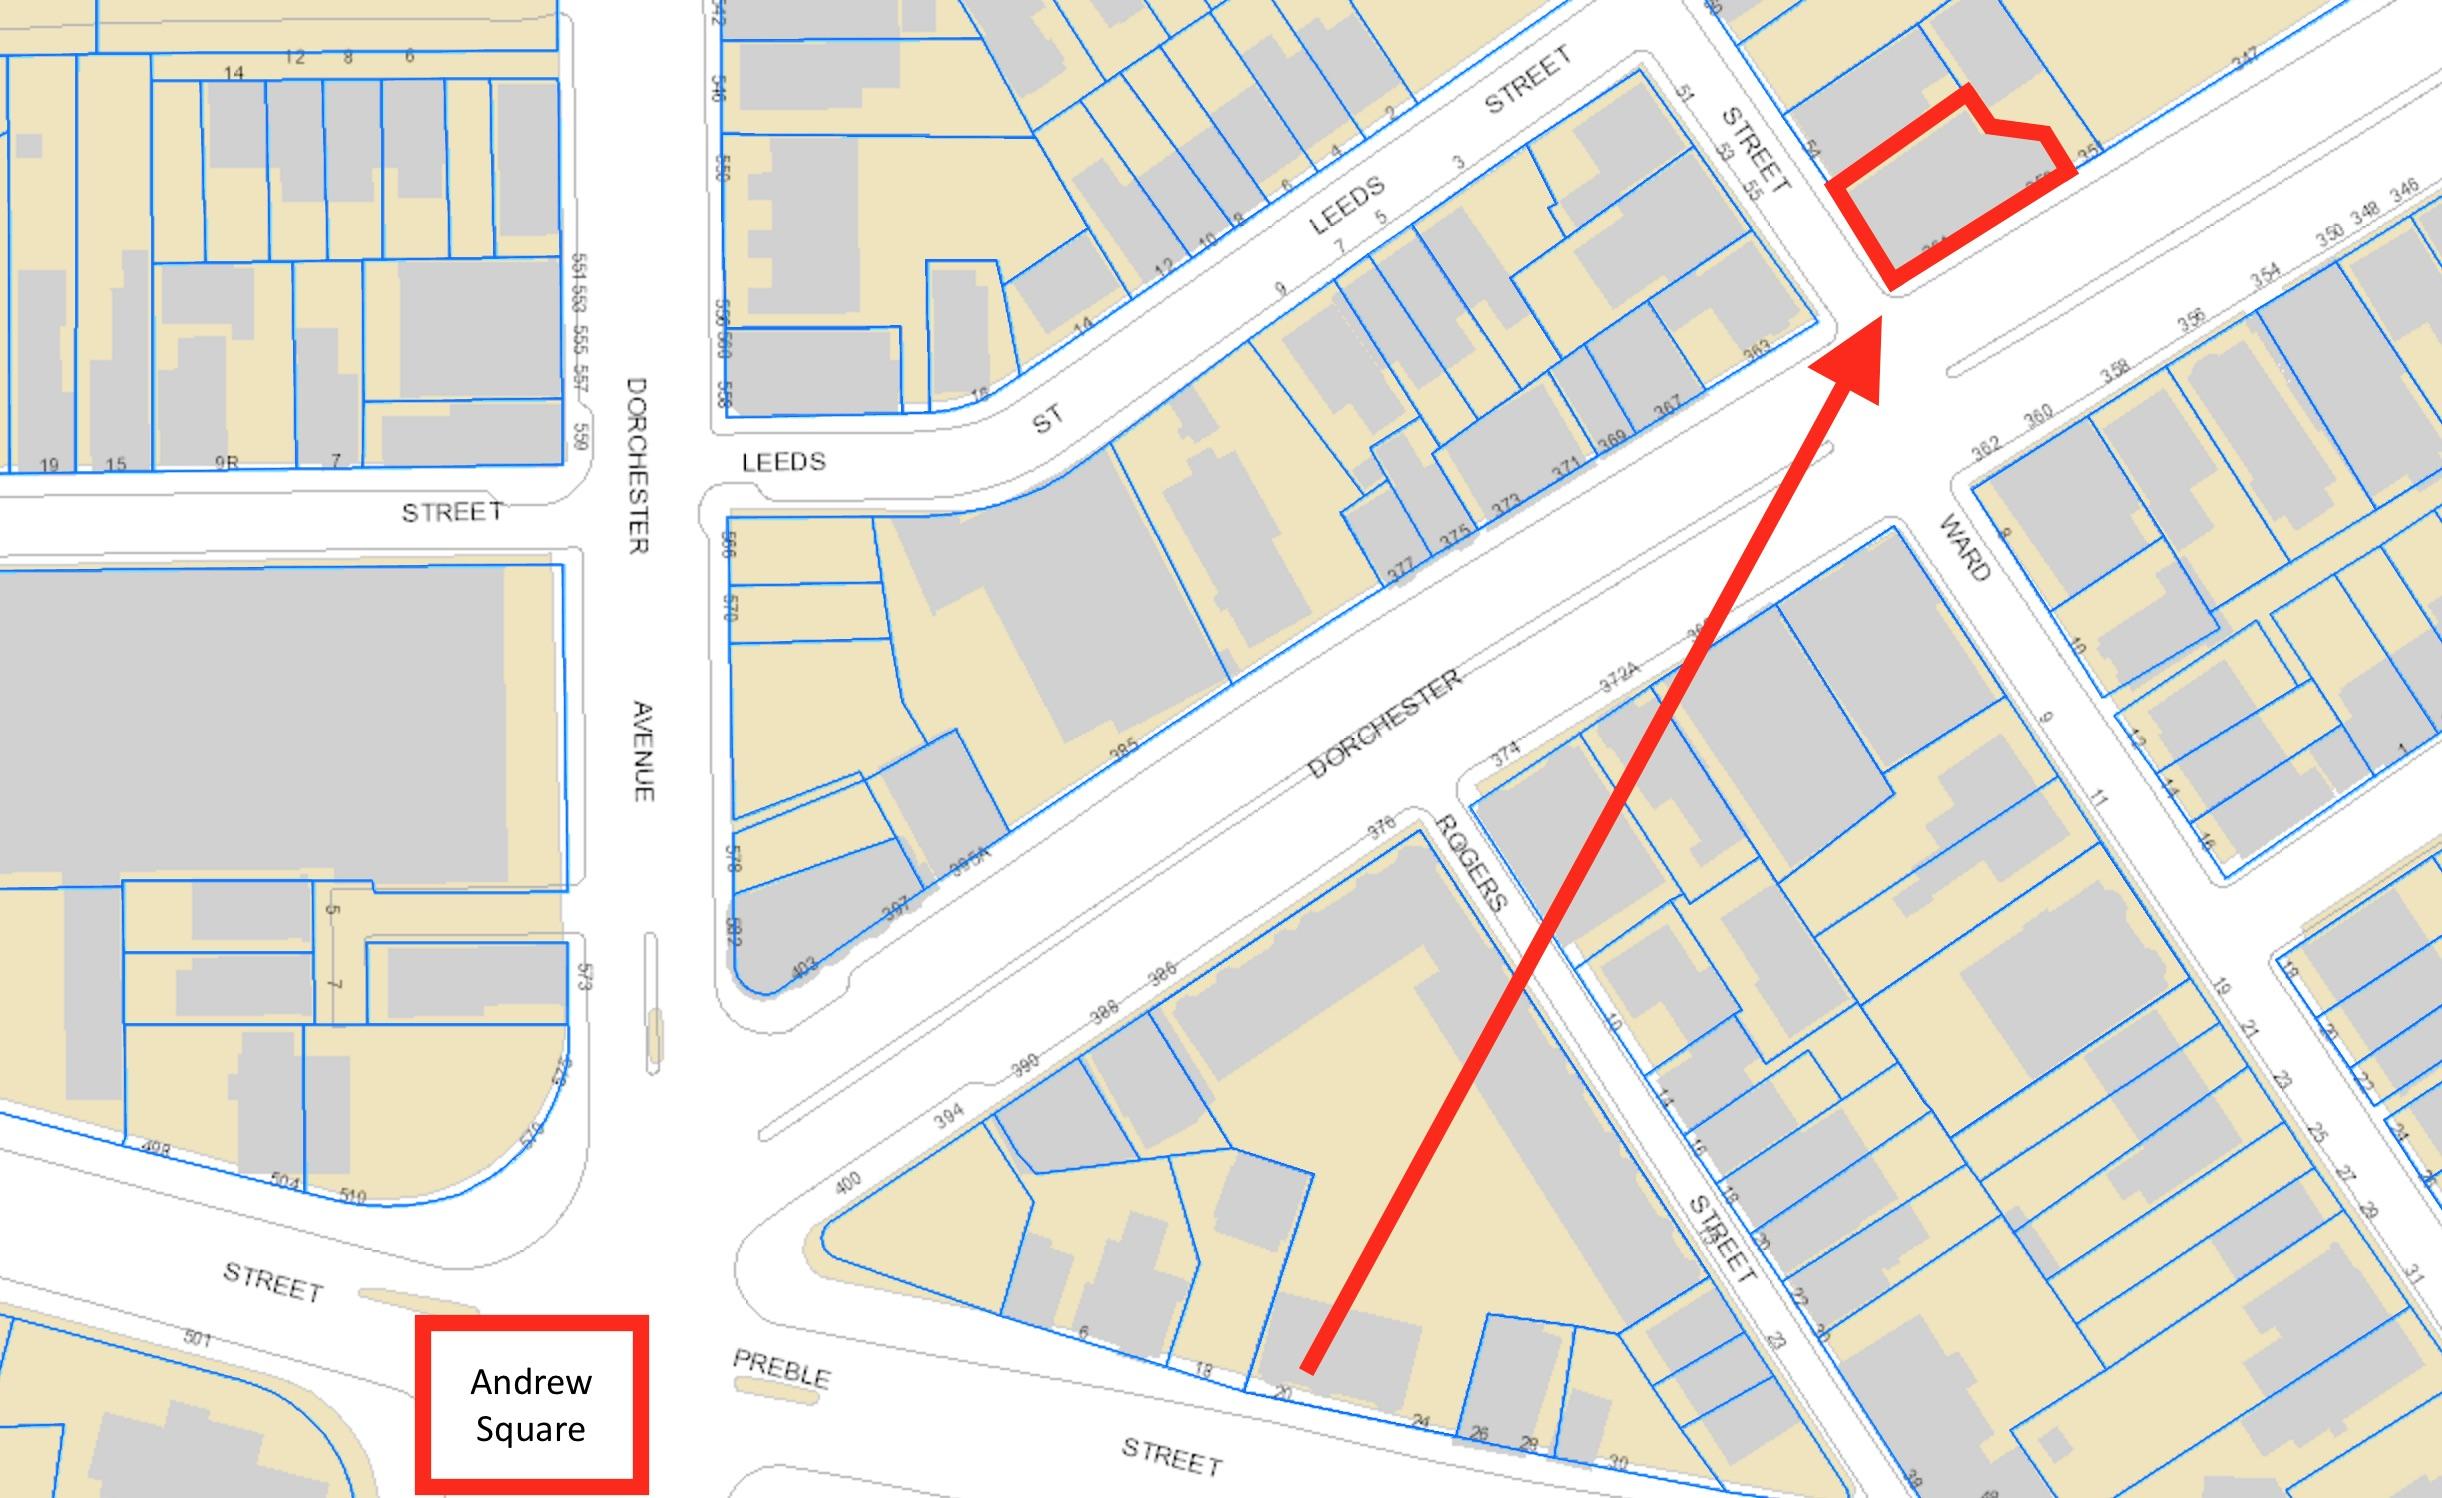 353 361 dorchester street andrew square south boston development project site colm dunphy real estate developer